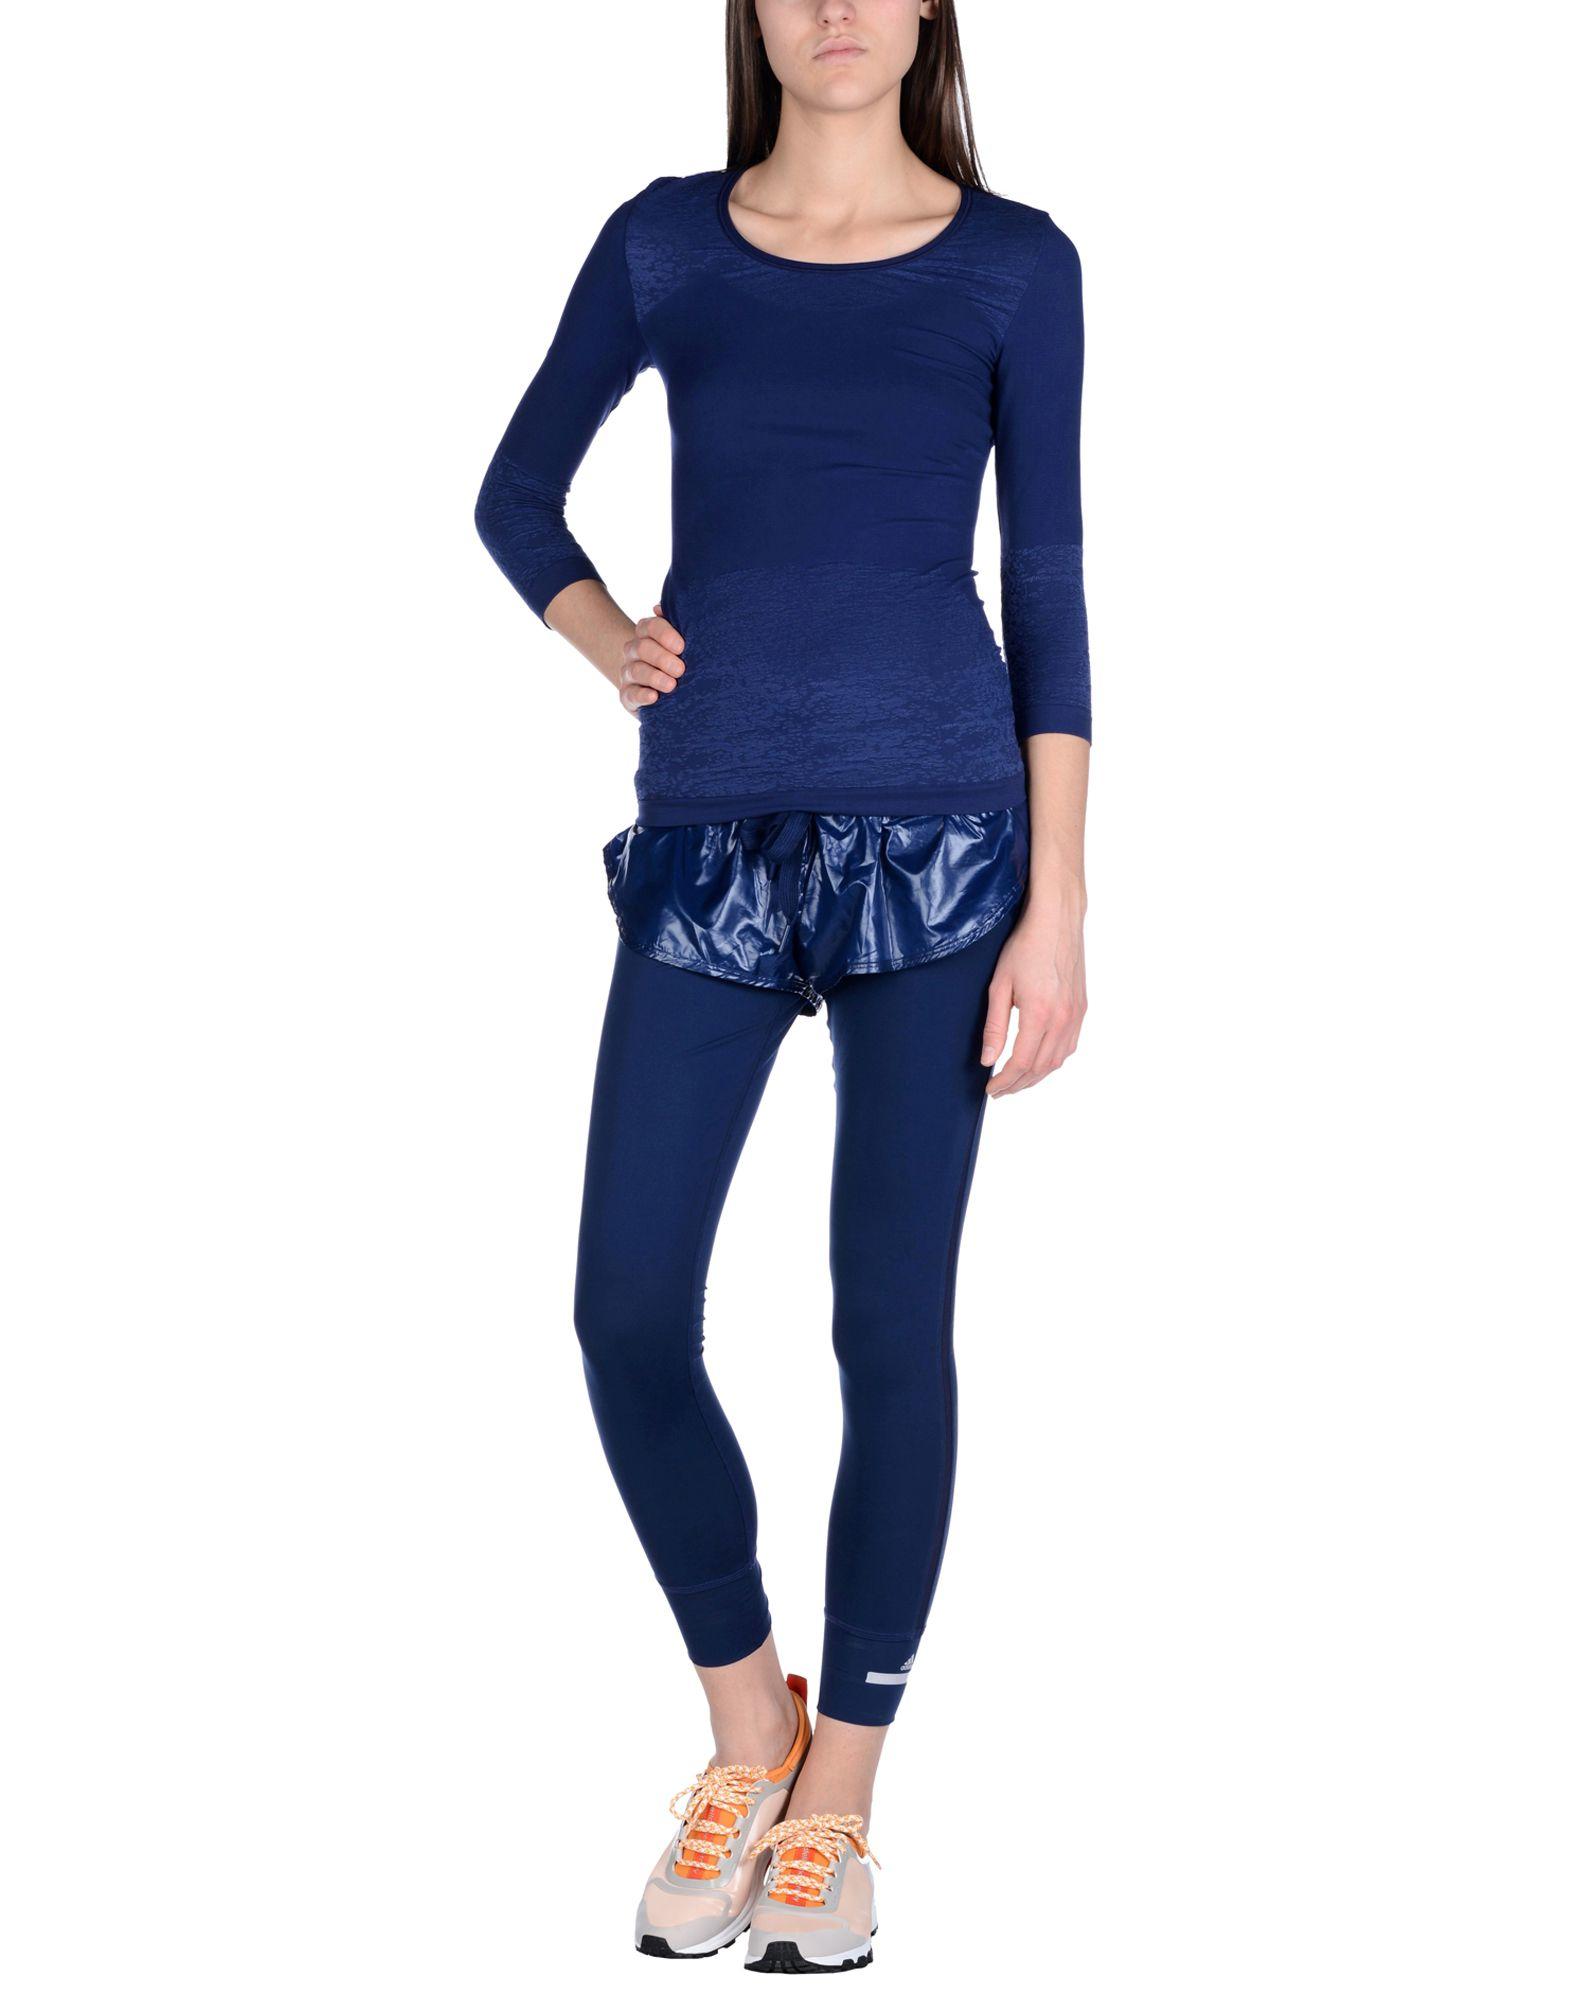 lyst adidas by stella mccartney leggings in blue. Black Bedroom Furniture Sets. Home Design Ideas